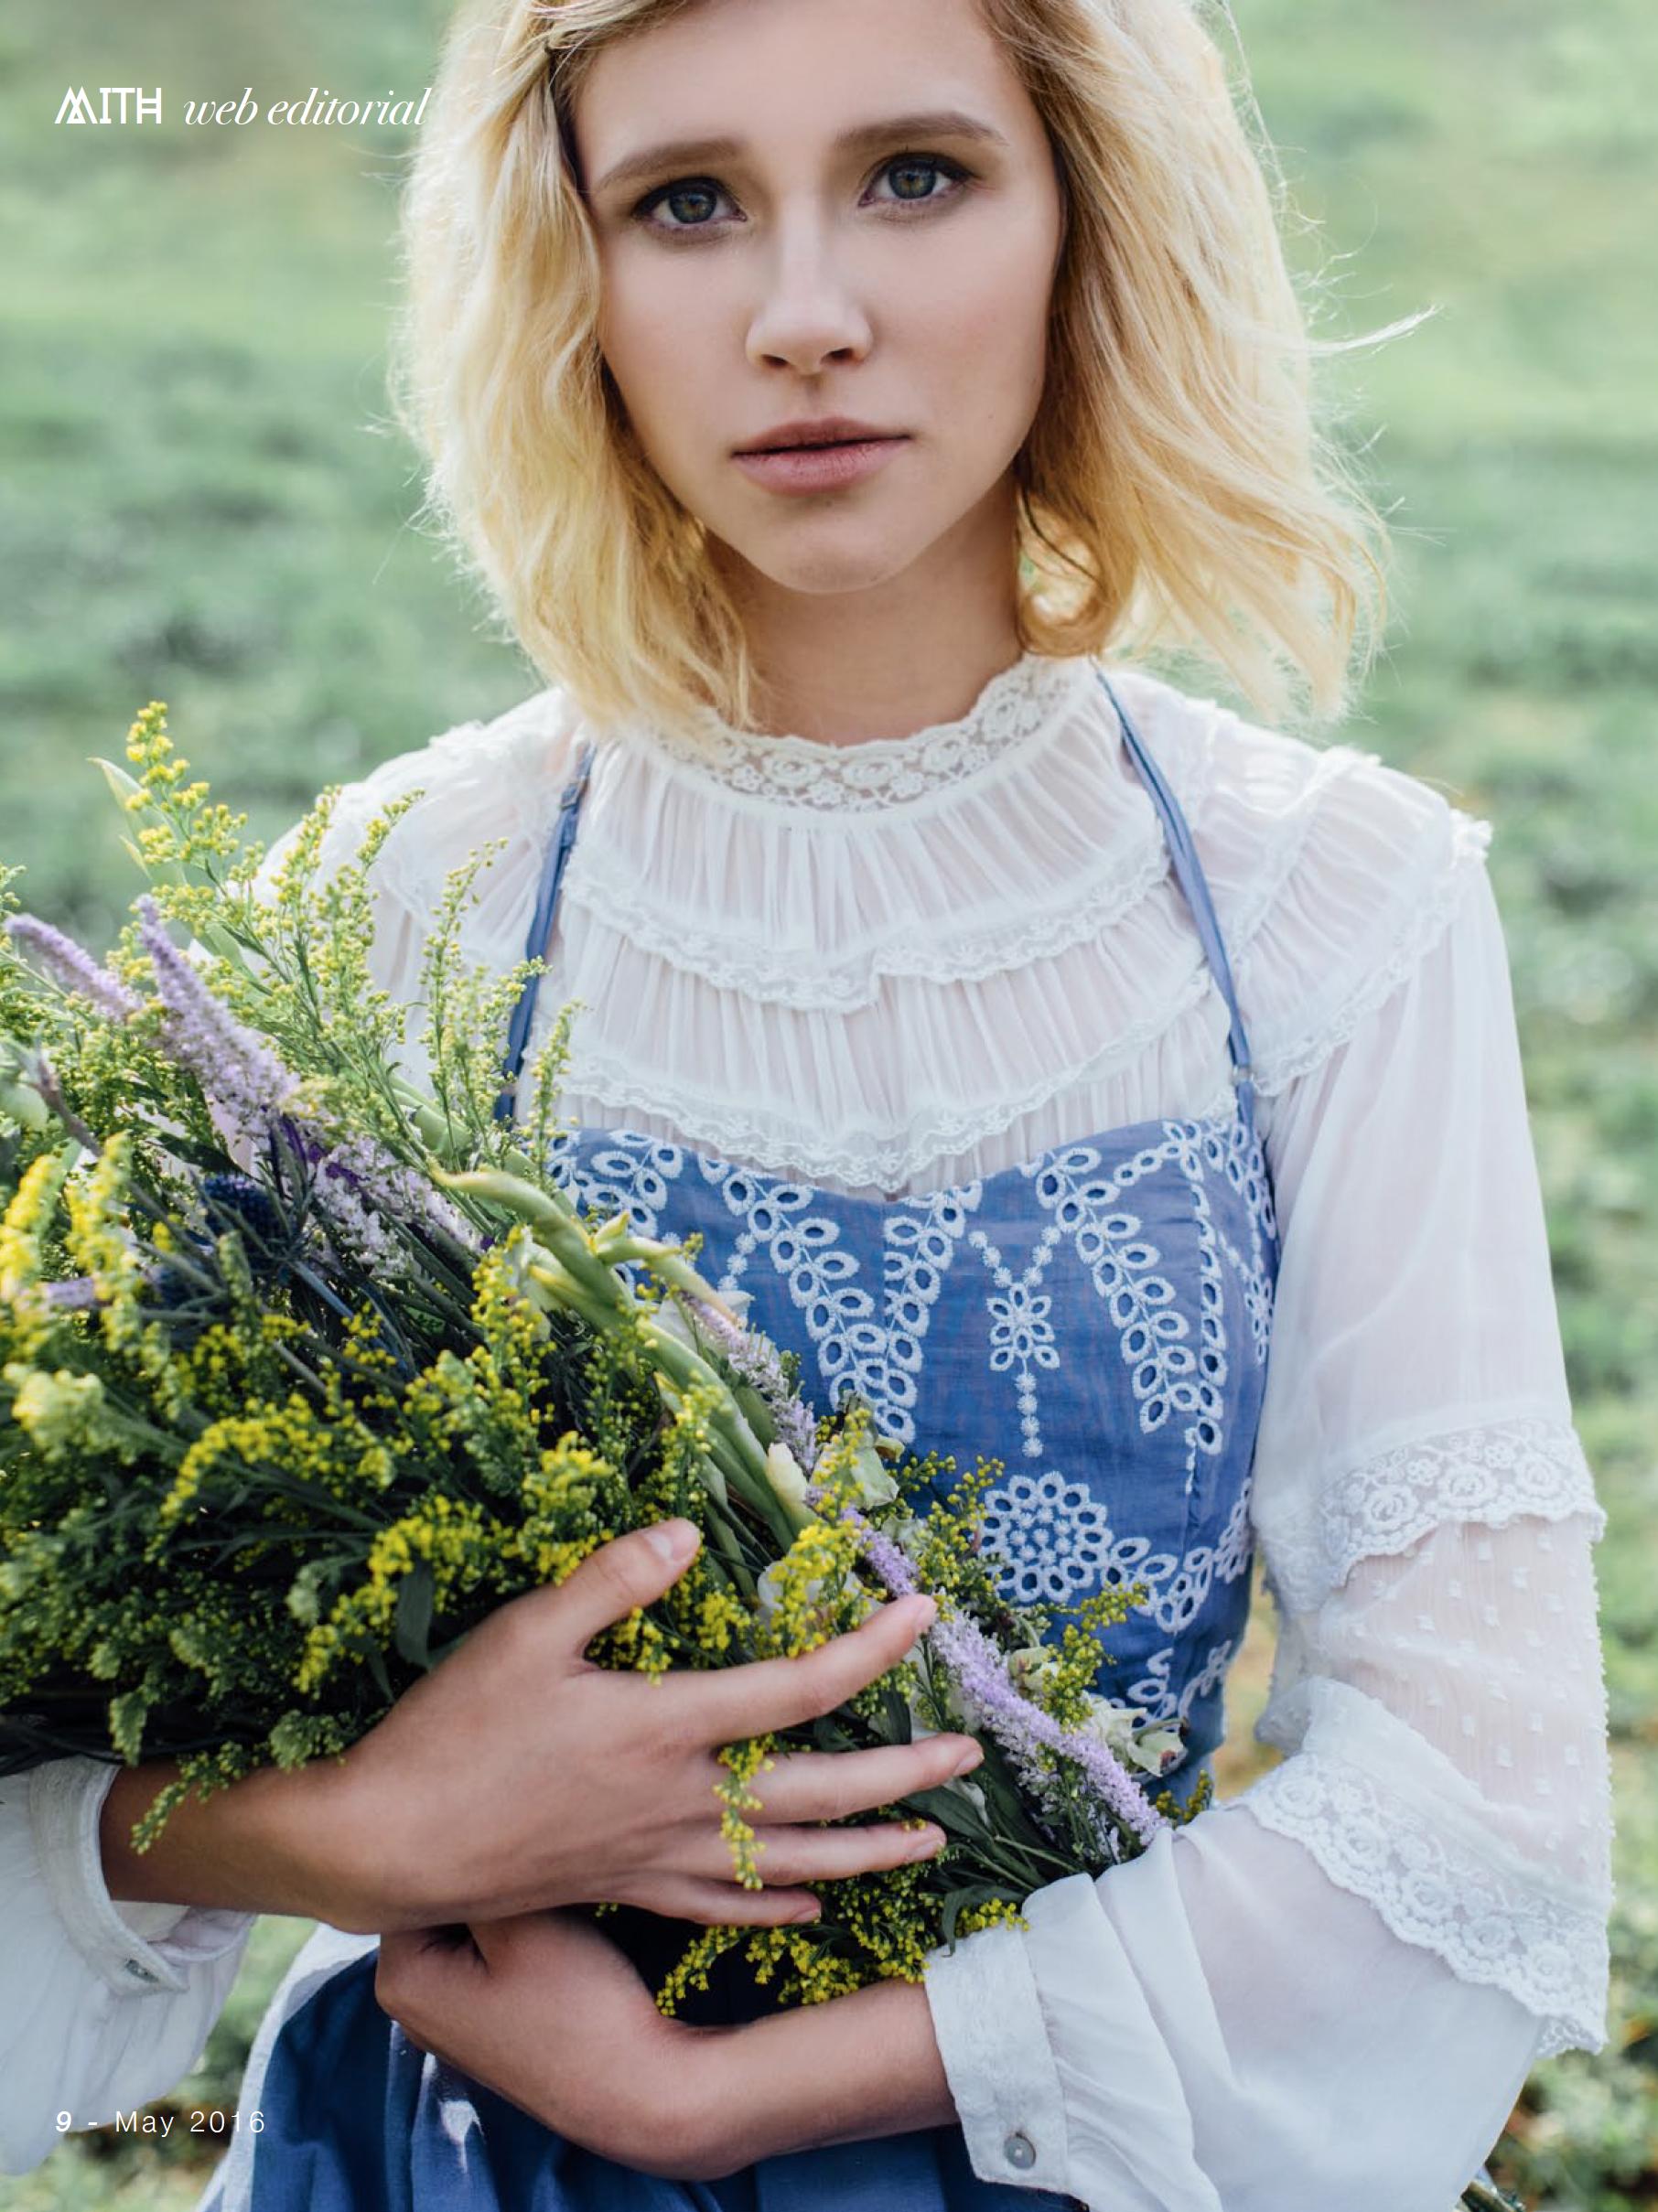 MITH_wildflower_Isa-Henderson_Haley-Tetreault7.png